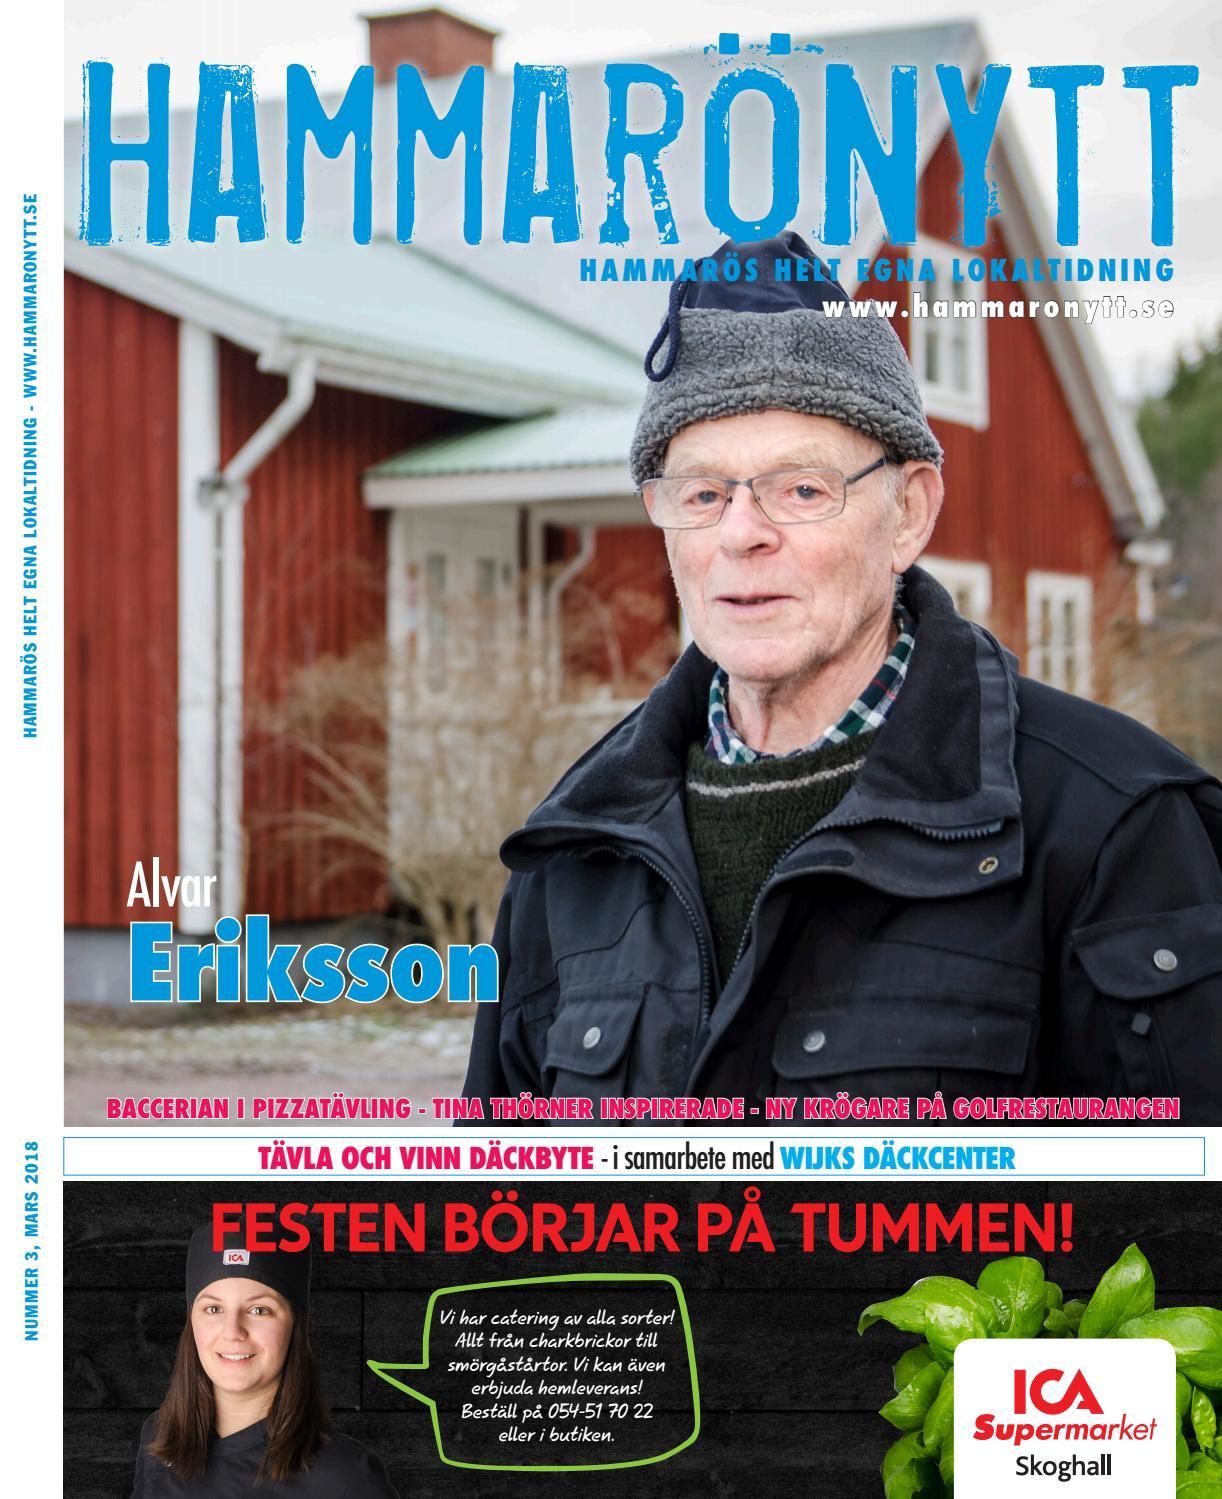 Pr Tomas Skog, Cederroths Vg 2, Skoghall   satisfaction-survey.net